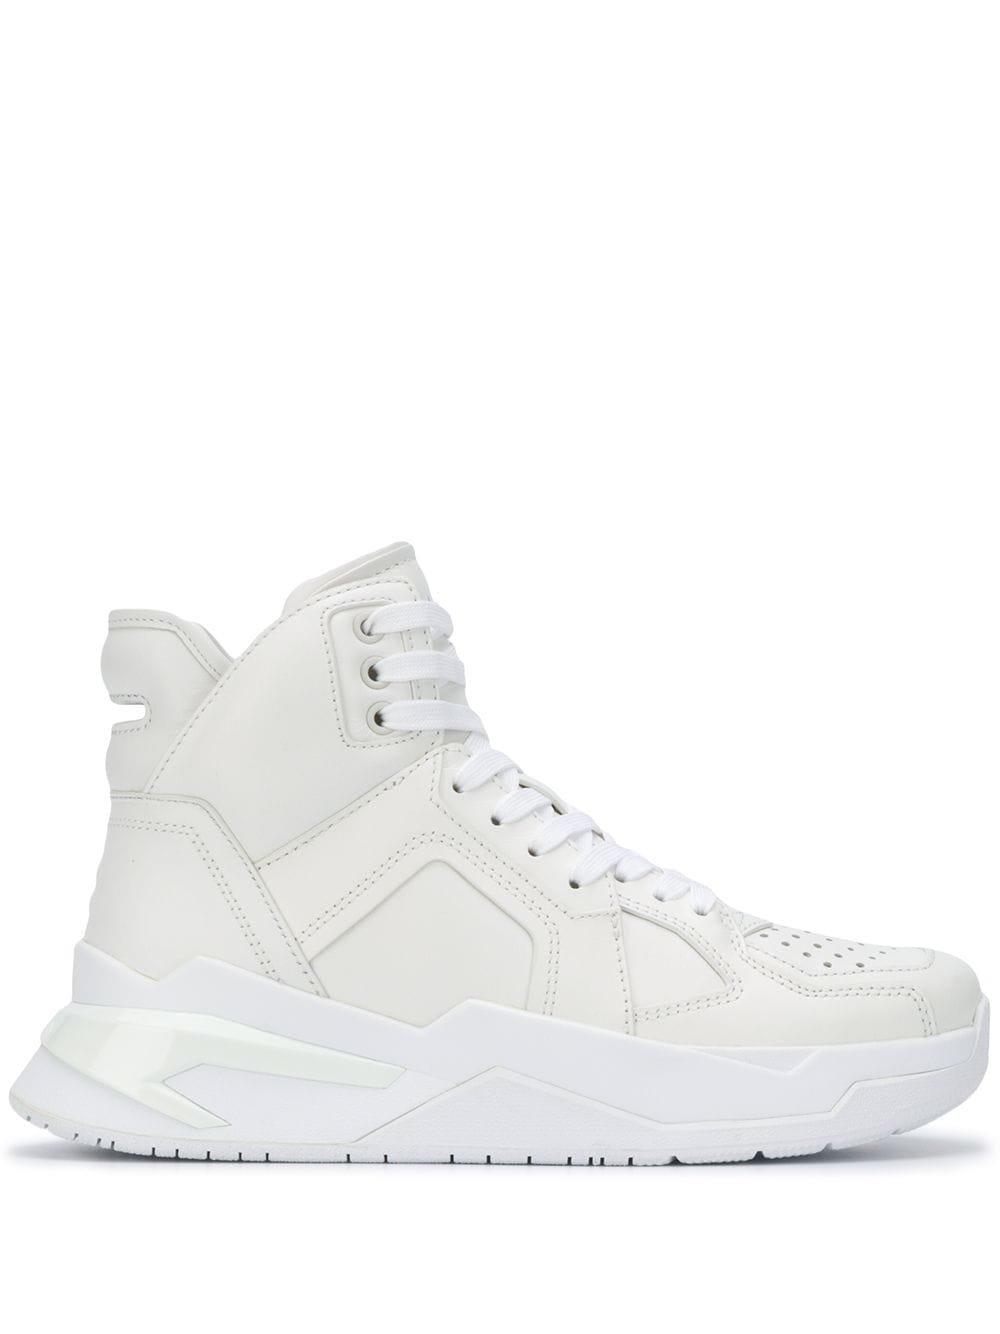 White Balmain B-Ball High Top Sneakers | Farfetch.com